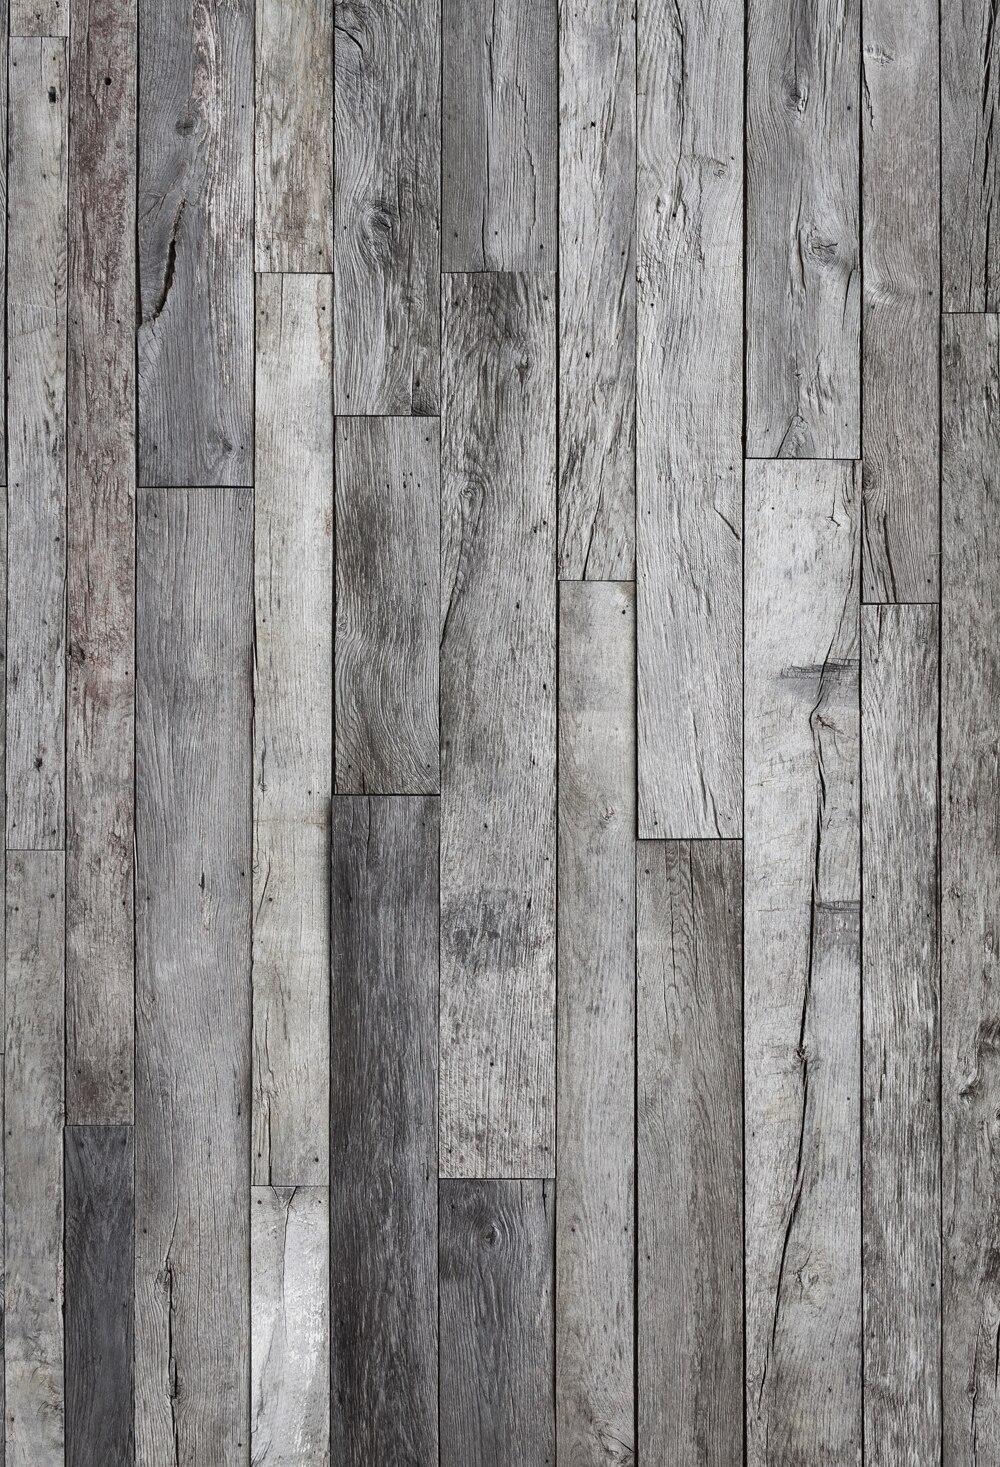 dark gray wood background wooden floor photography backdrops newborn photo props baby shower pictures newborn props xt 6712